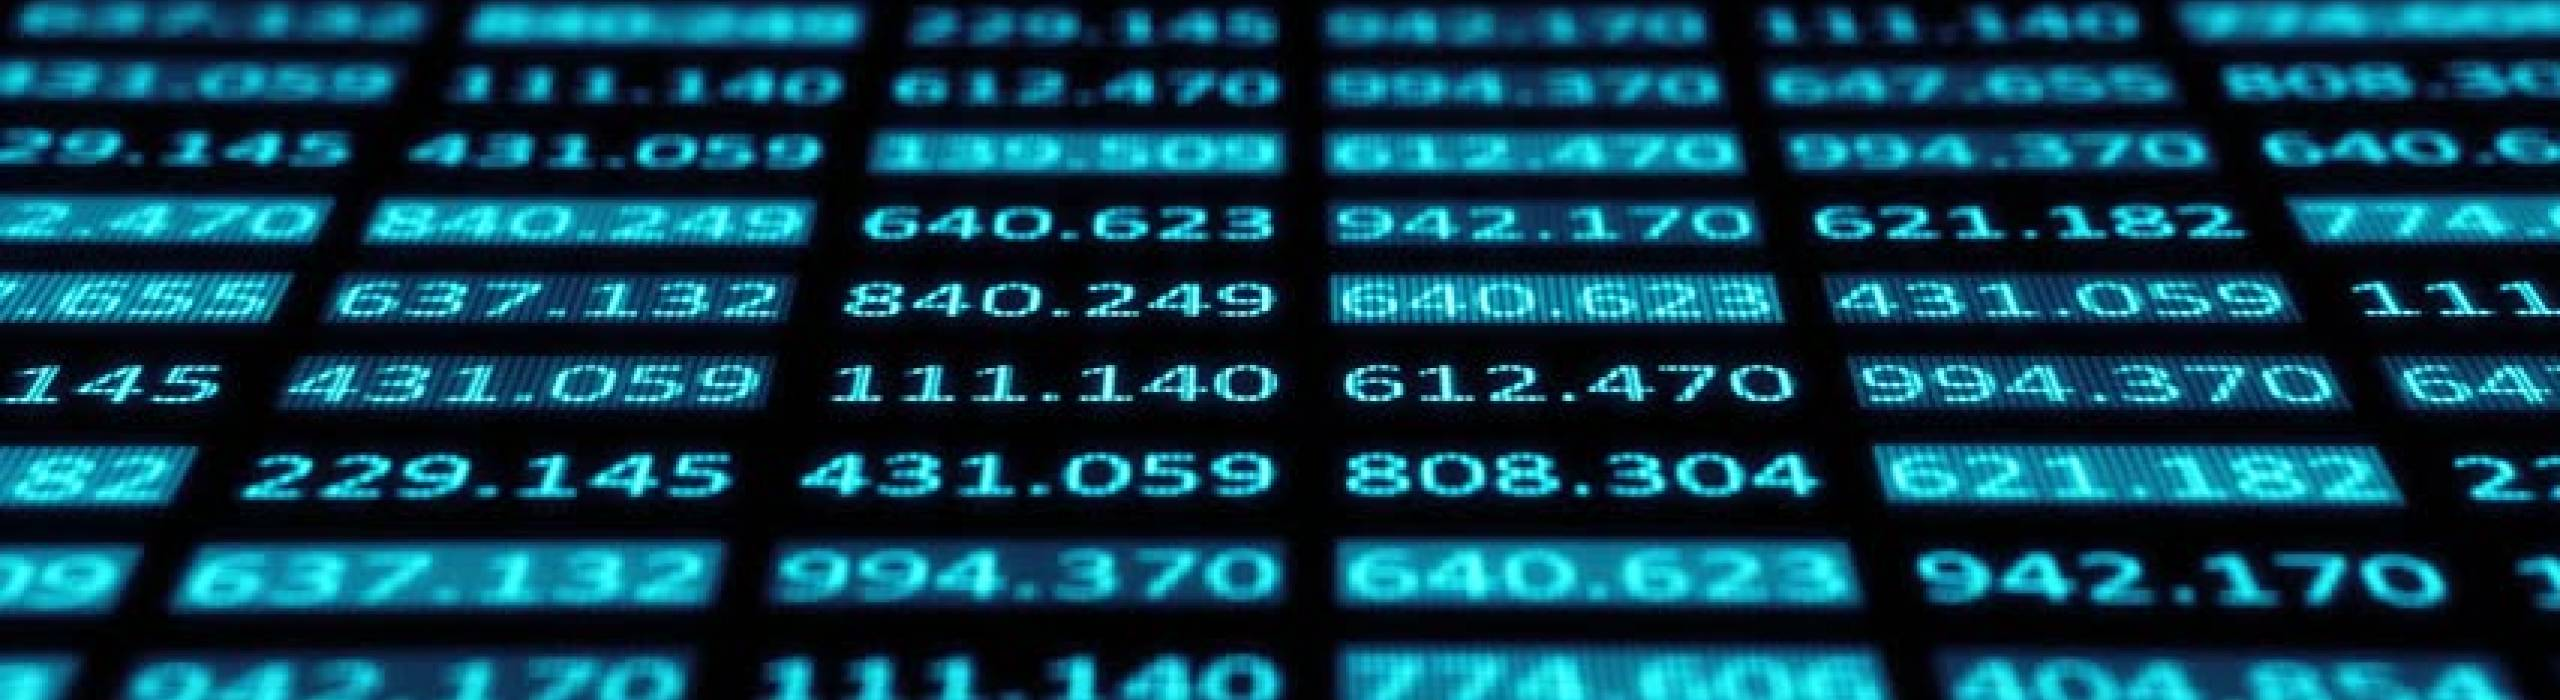 Critical Data Studies banner - coding stock